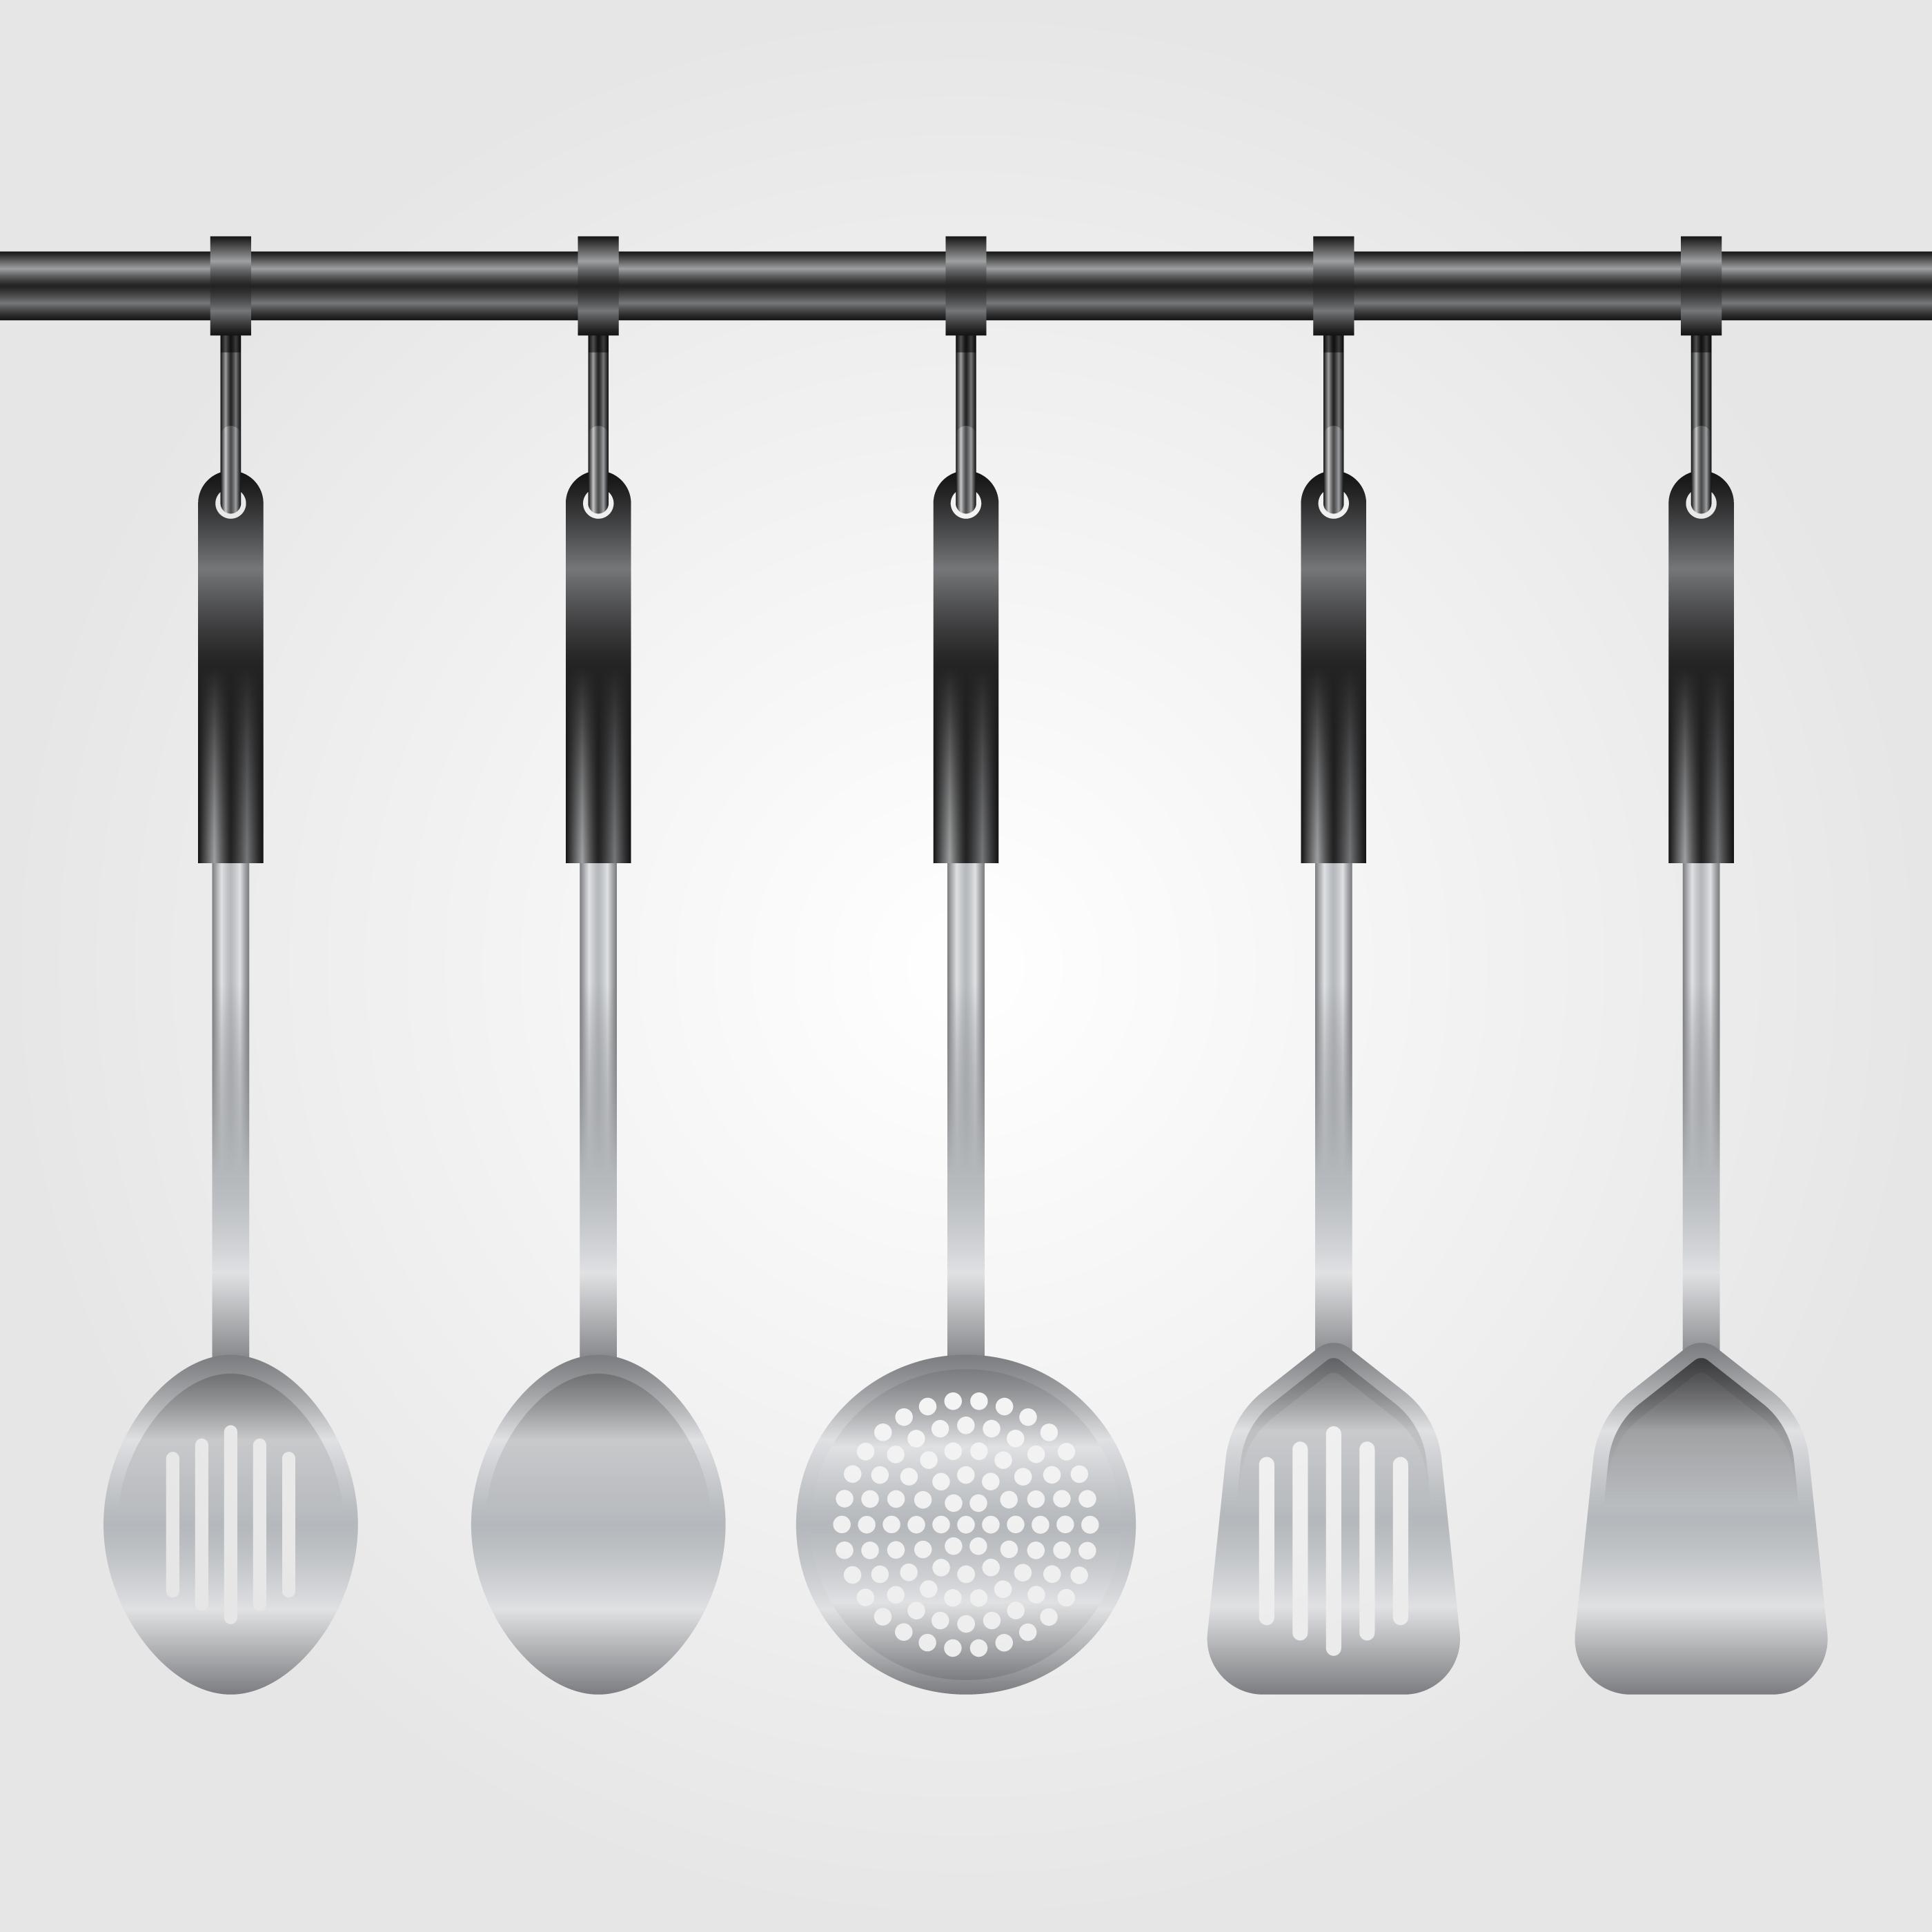 Realistic Kitchen Utensil Collection Illustration